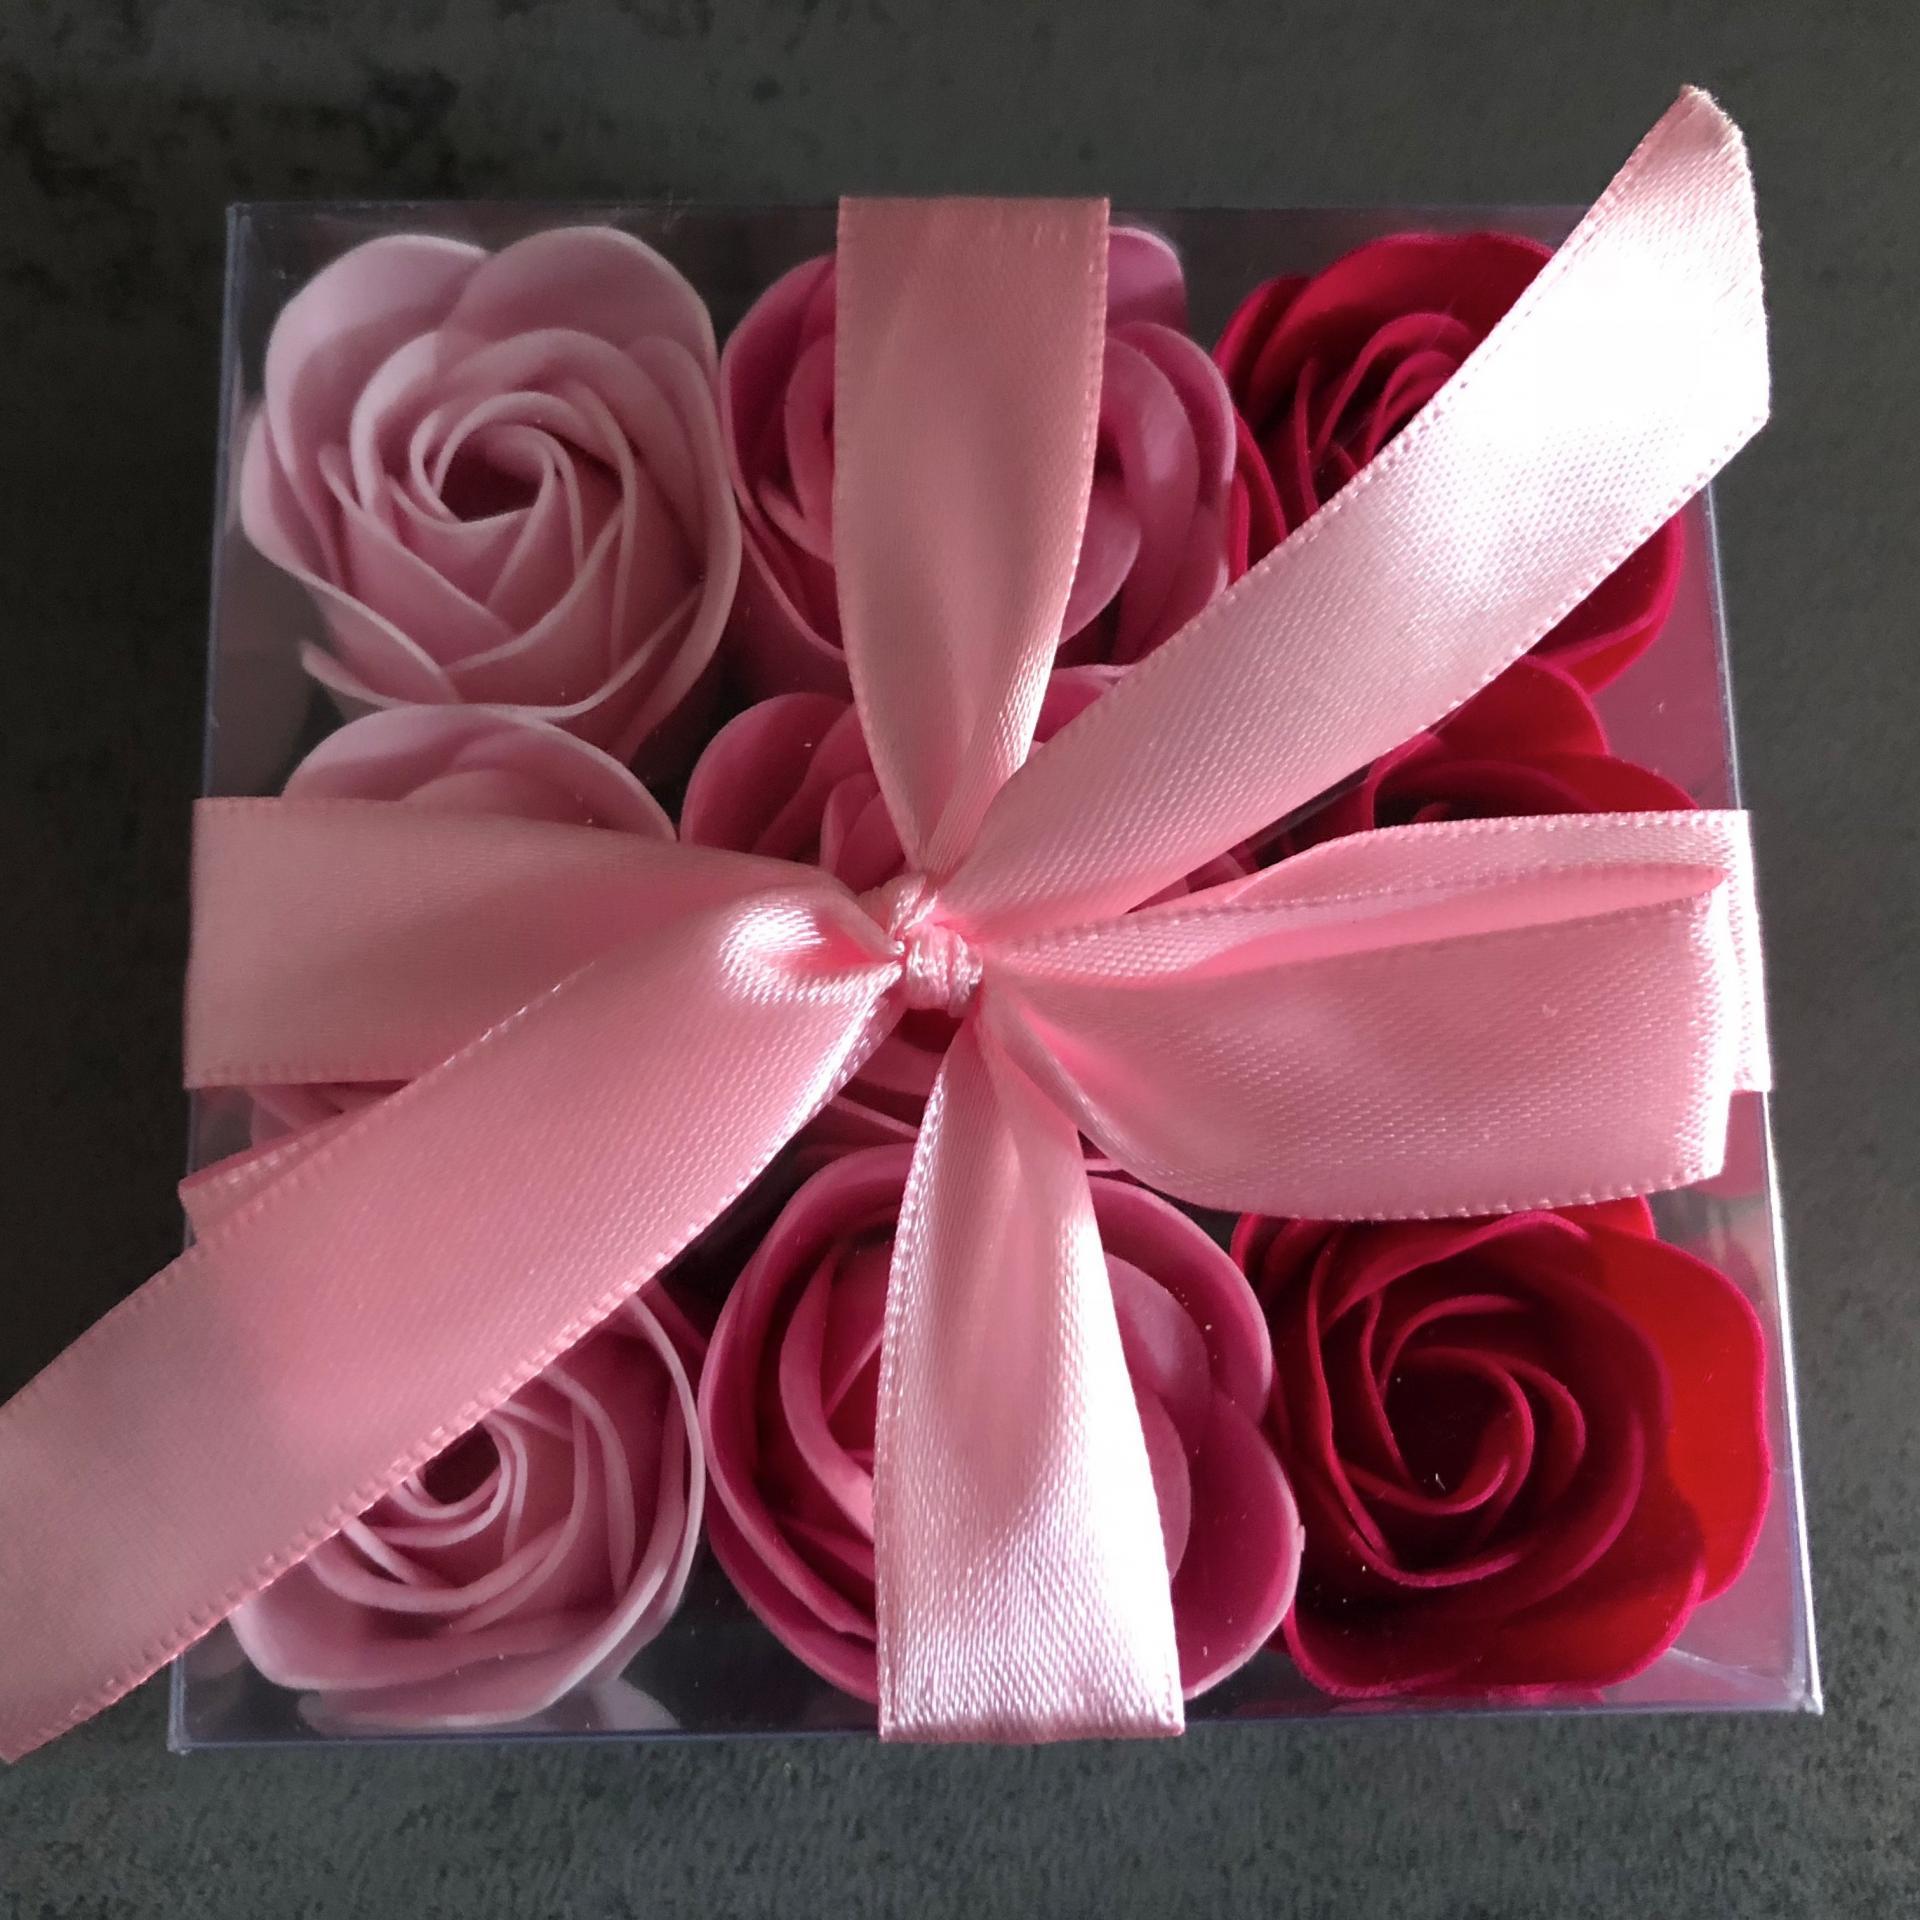 Boutons de rose x9 rose rouge